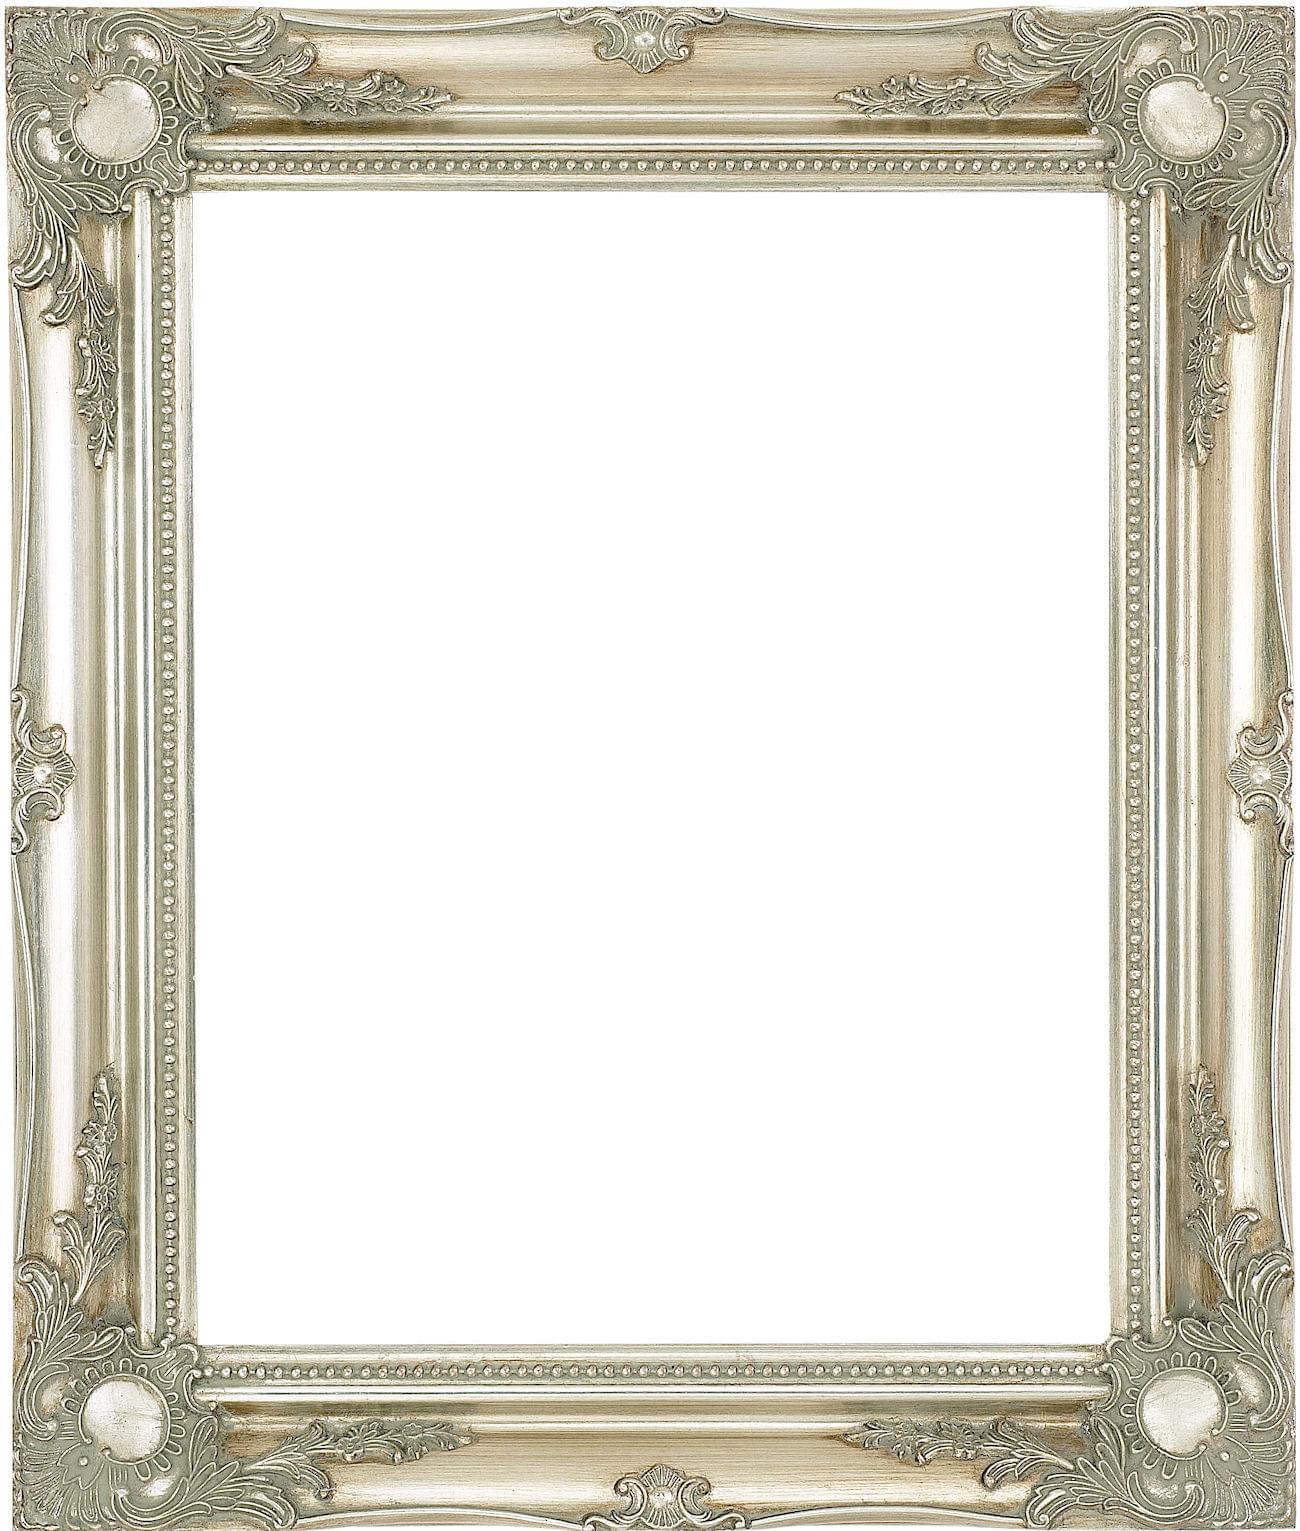 8x10 Black Wall Frame